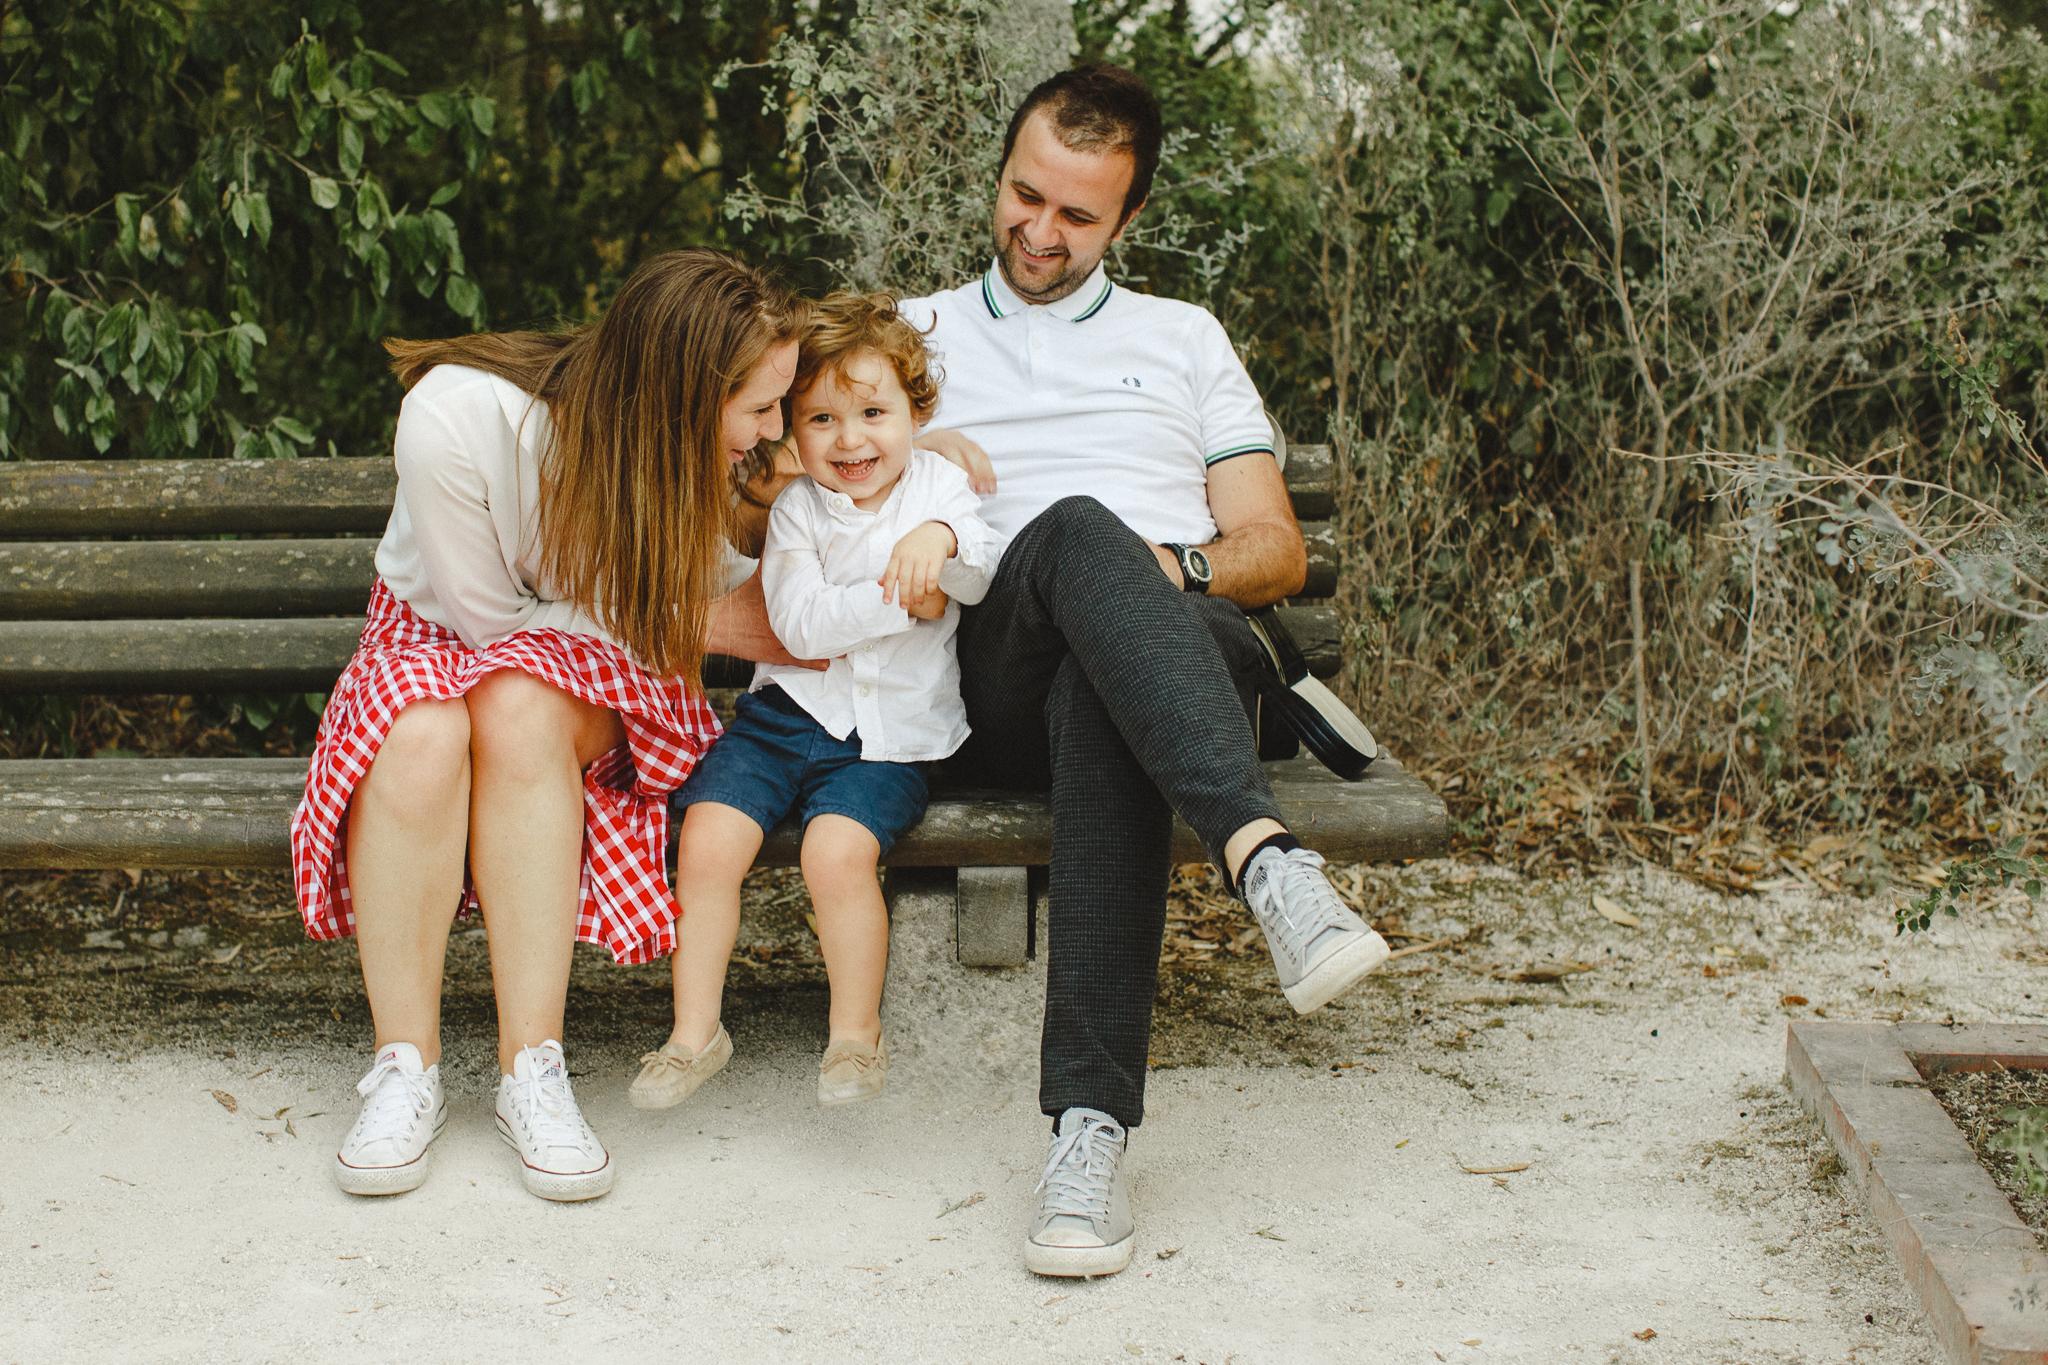 Sessão de Família em Monsanto, Family Photo Shoot in Lisbon by Hello Twiggs